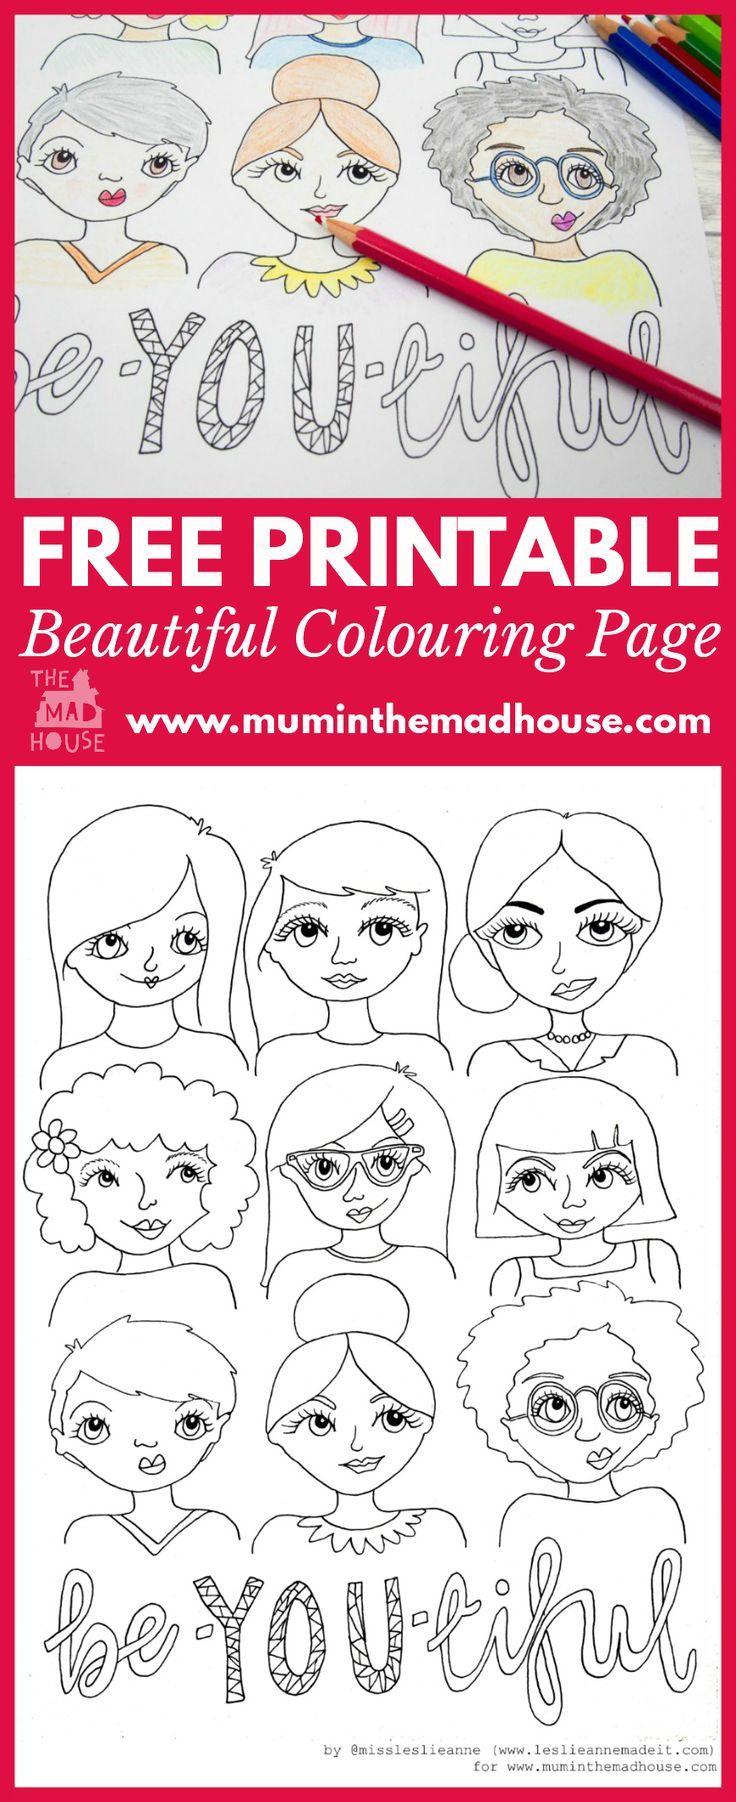 069f6d898e1577042e29b11116300bfa--free-colouring-pages-random-drawings